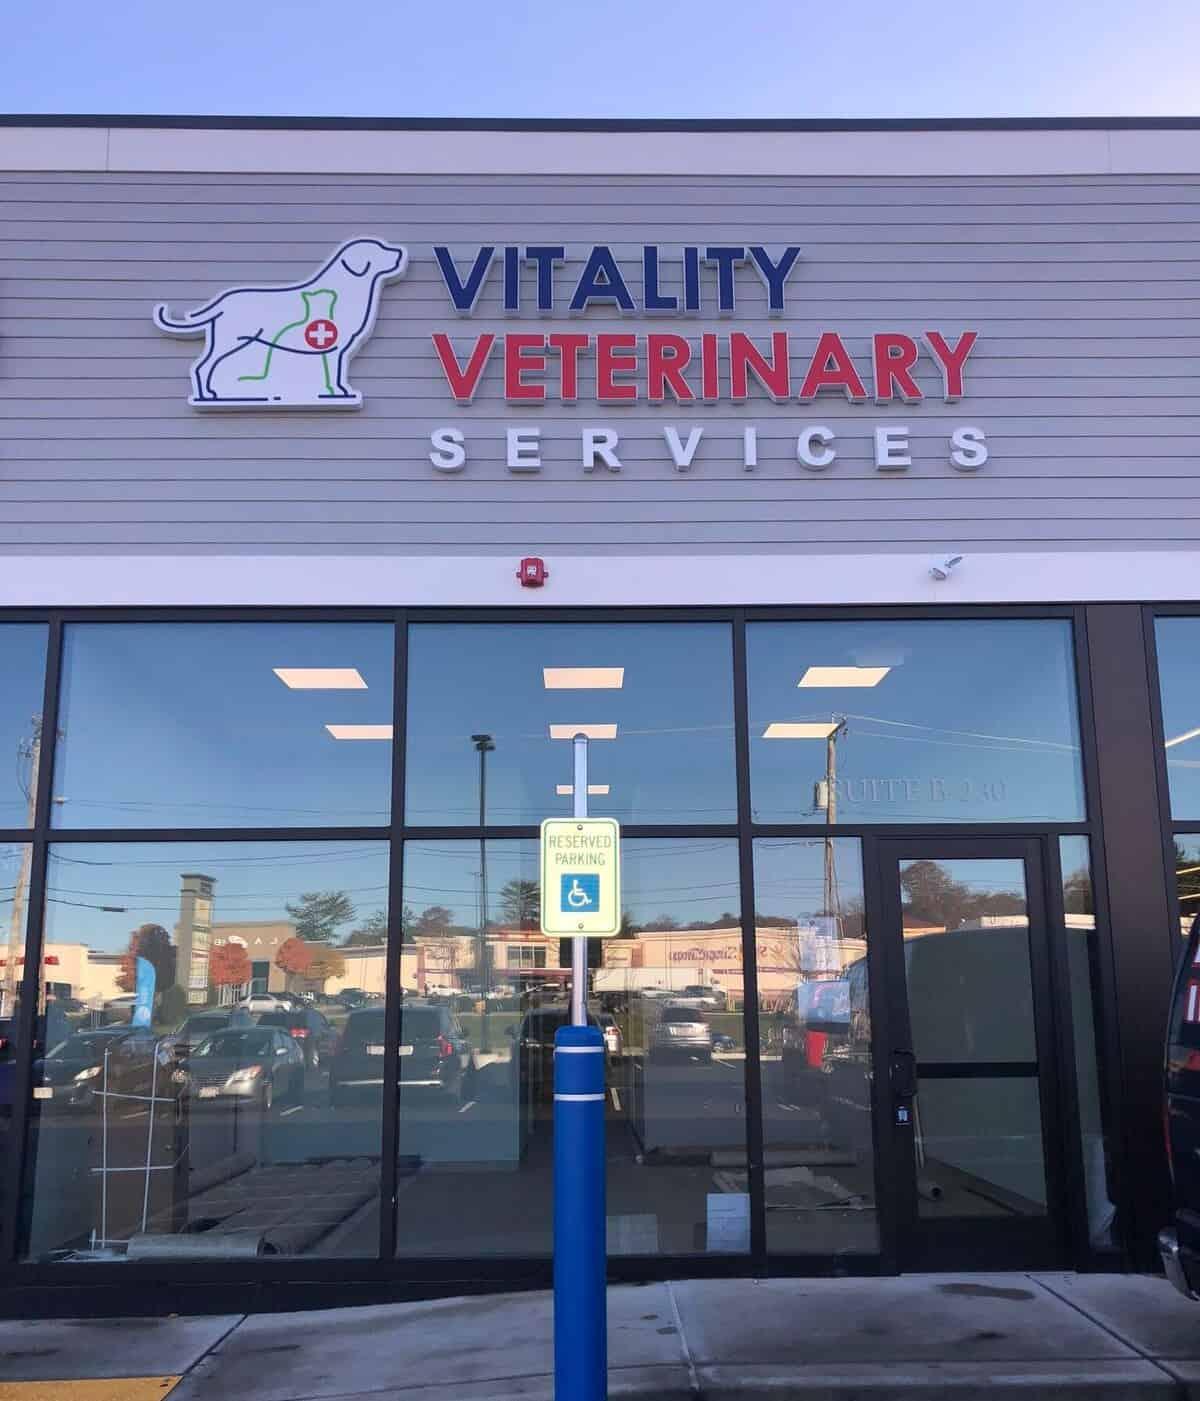 vitality vet channel letters